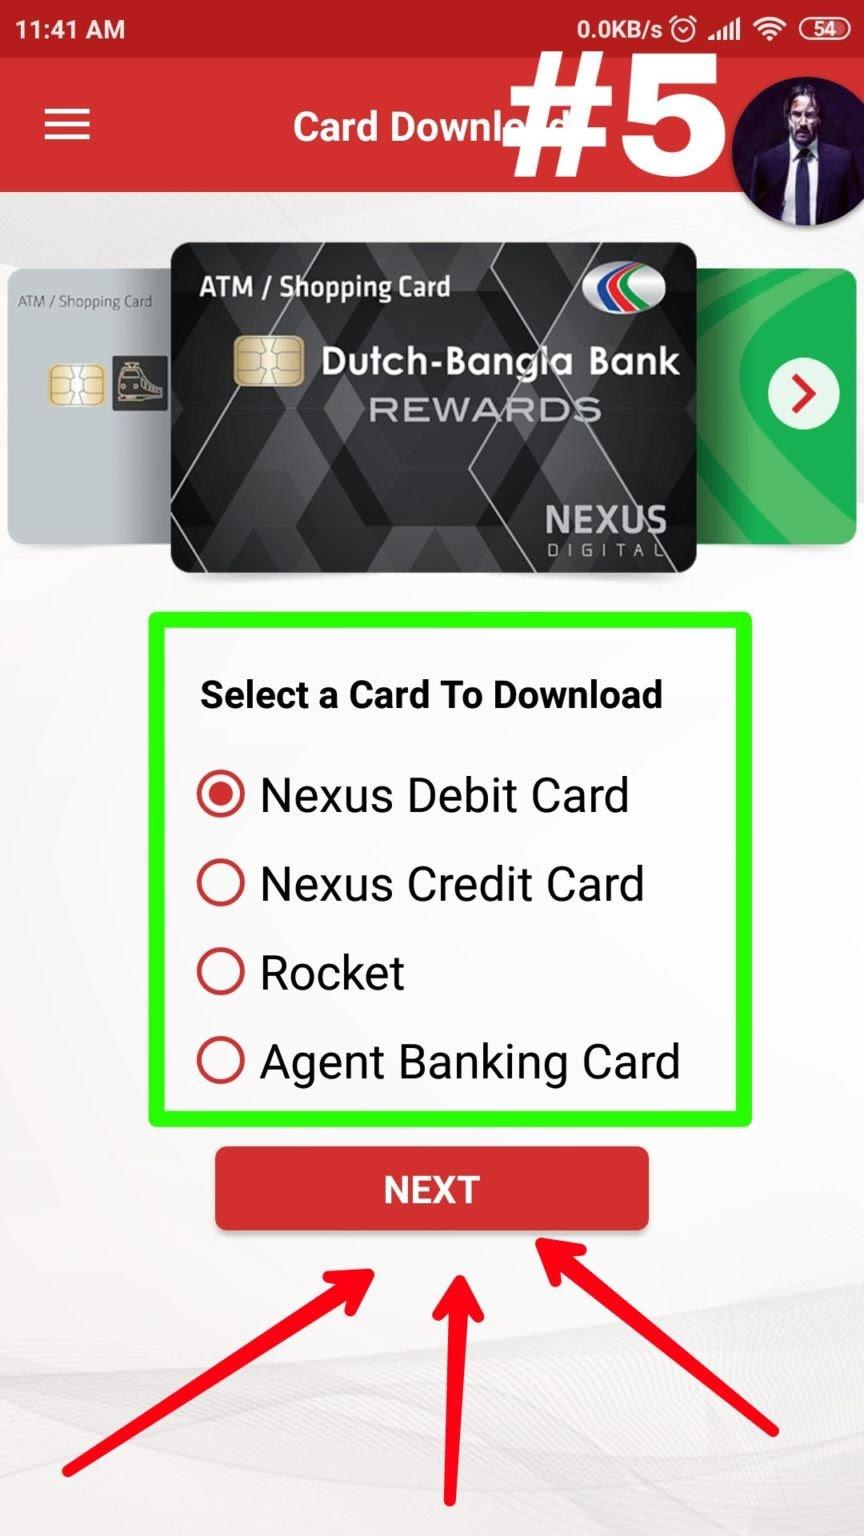 [DBBL] Nexuspay একাউন্ট খোলা এবং কার্ড এড যেভাবে করবেন [ How to open a Nexuspay account]